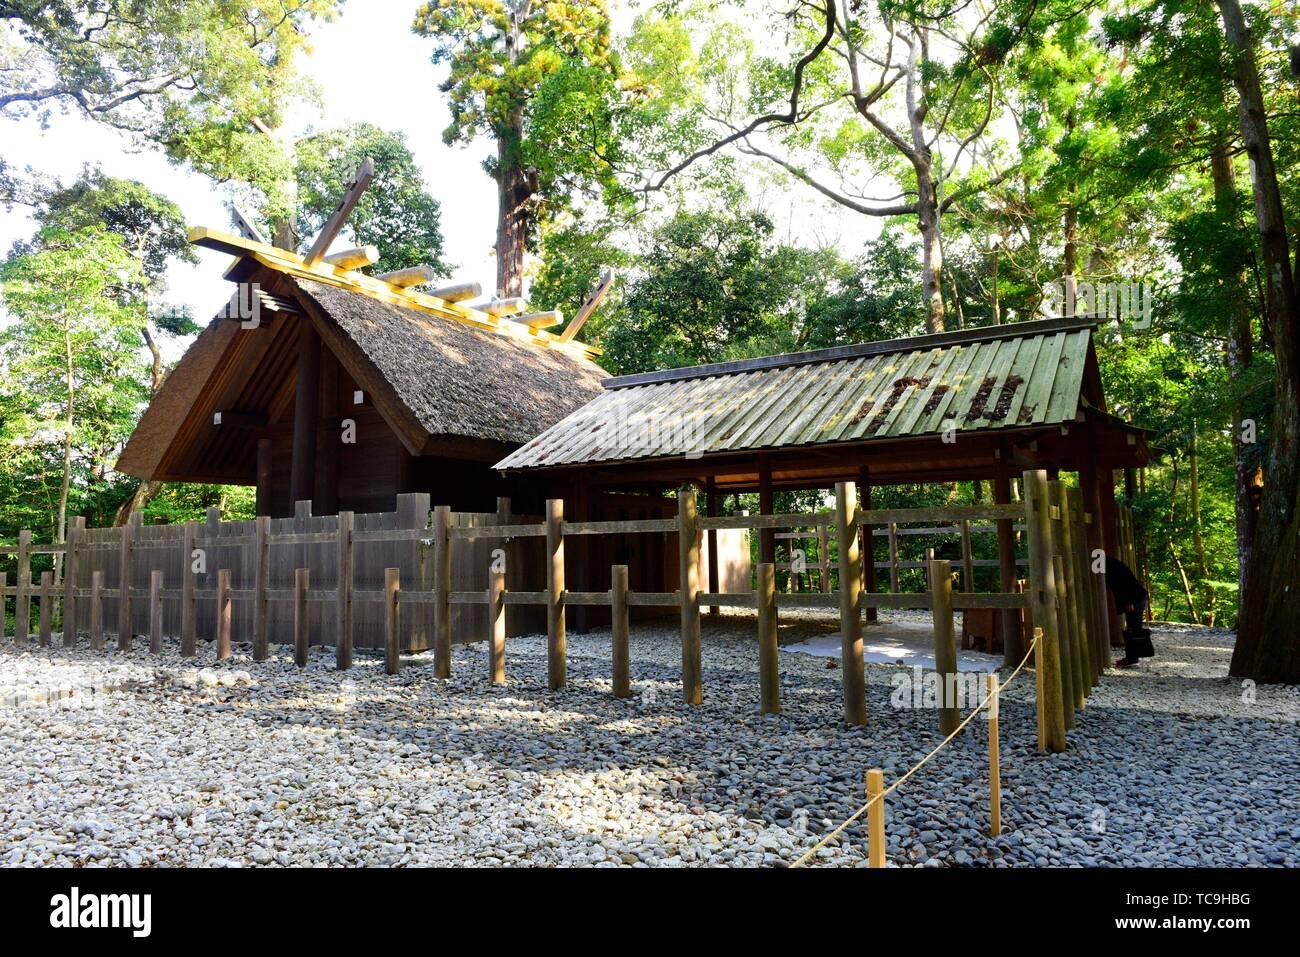 Kaze-no-miya subordinate shrine with oi-ya hut in Kodenchi area, Geku, Ise Jinju, Mie, Japan, Asia. - Stock Image